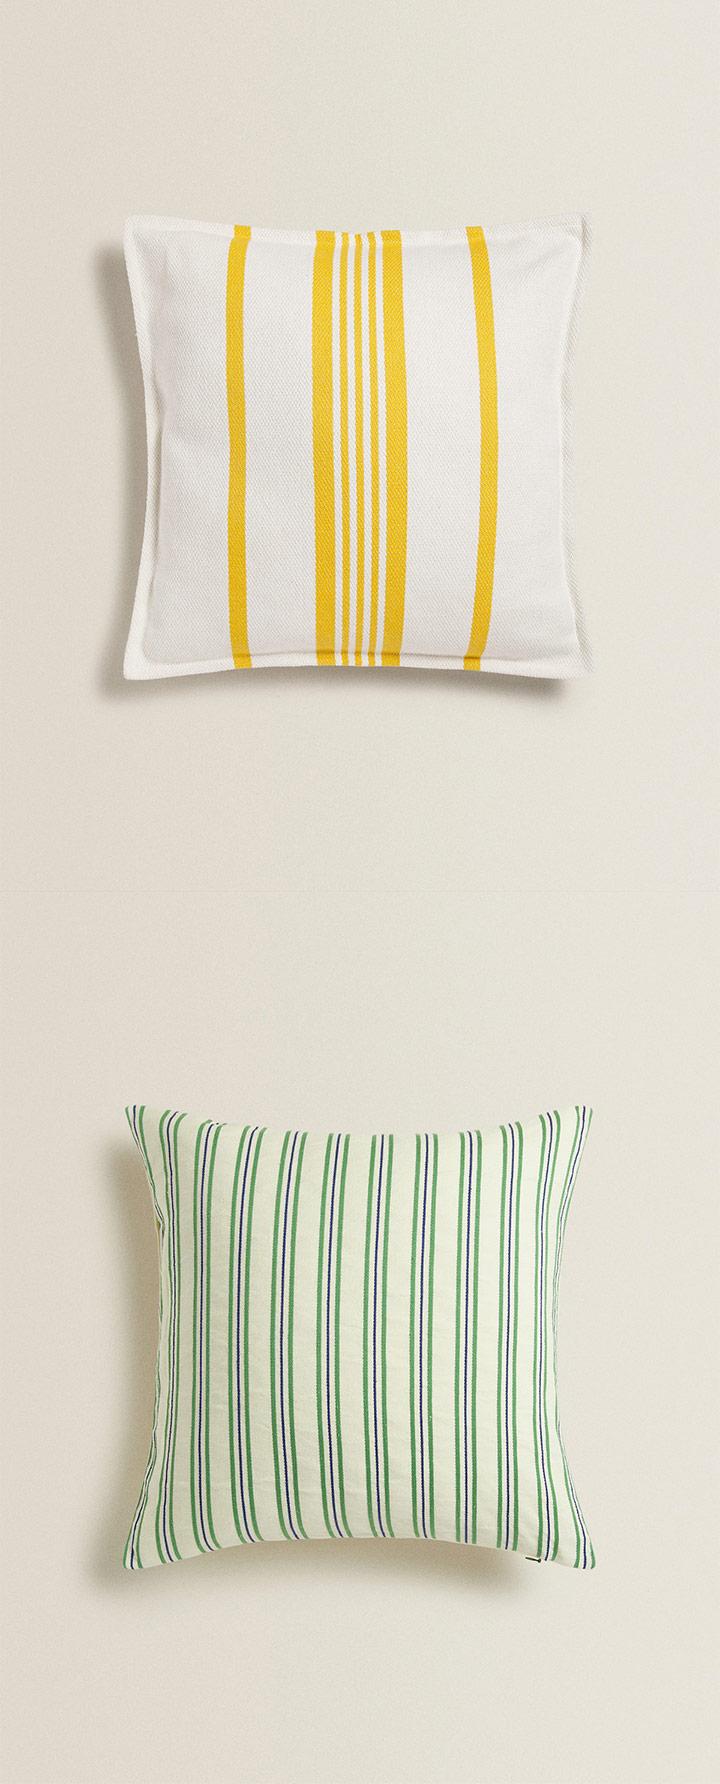 Catálogo cojines Zara Home a rayas